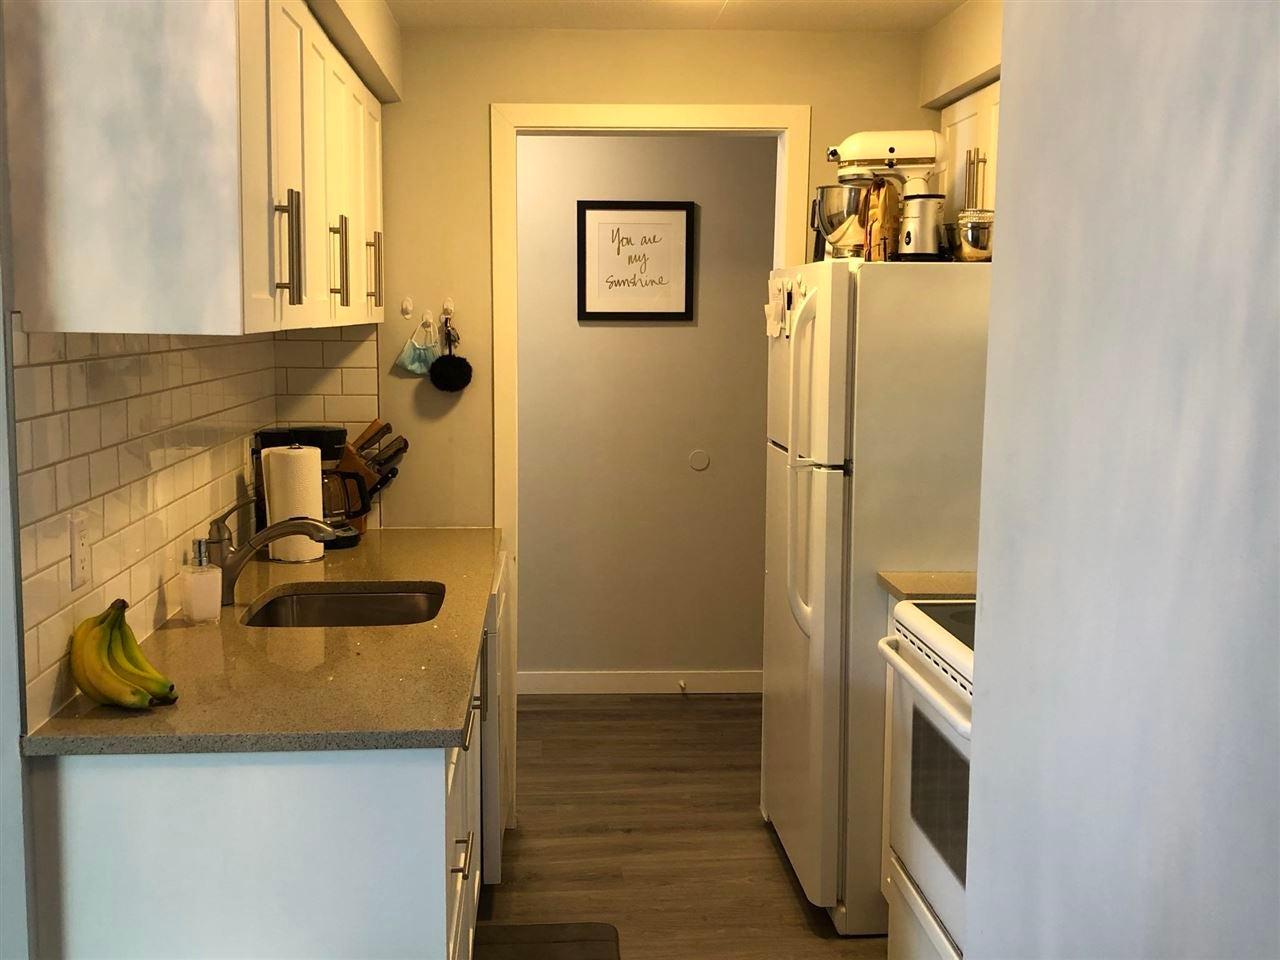 304 15238 100 AVENUE - Guildford Apartment/Condo for sale, 1 Bedroom (R2576105) - #9